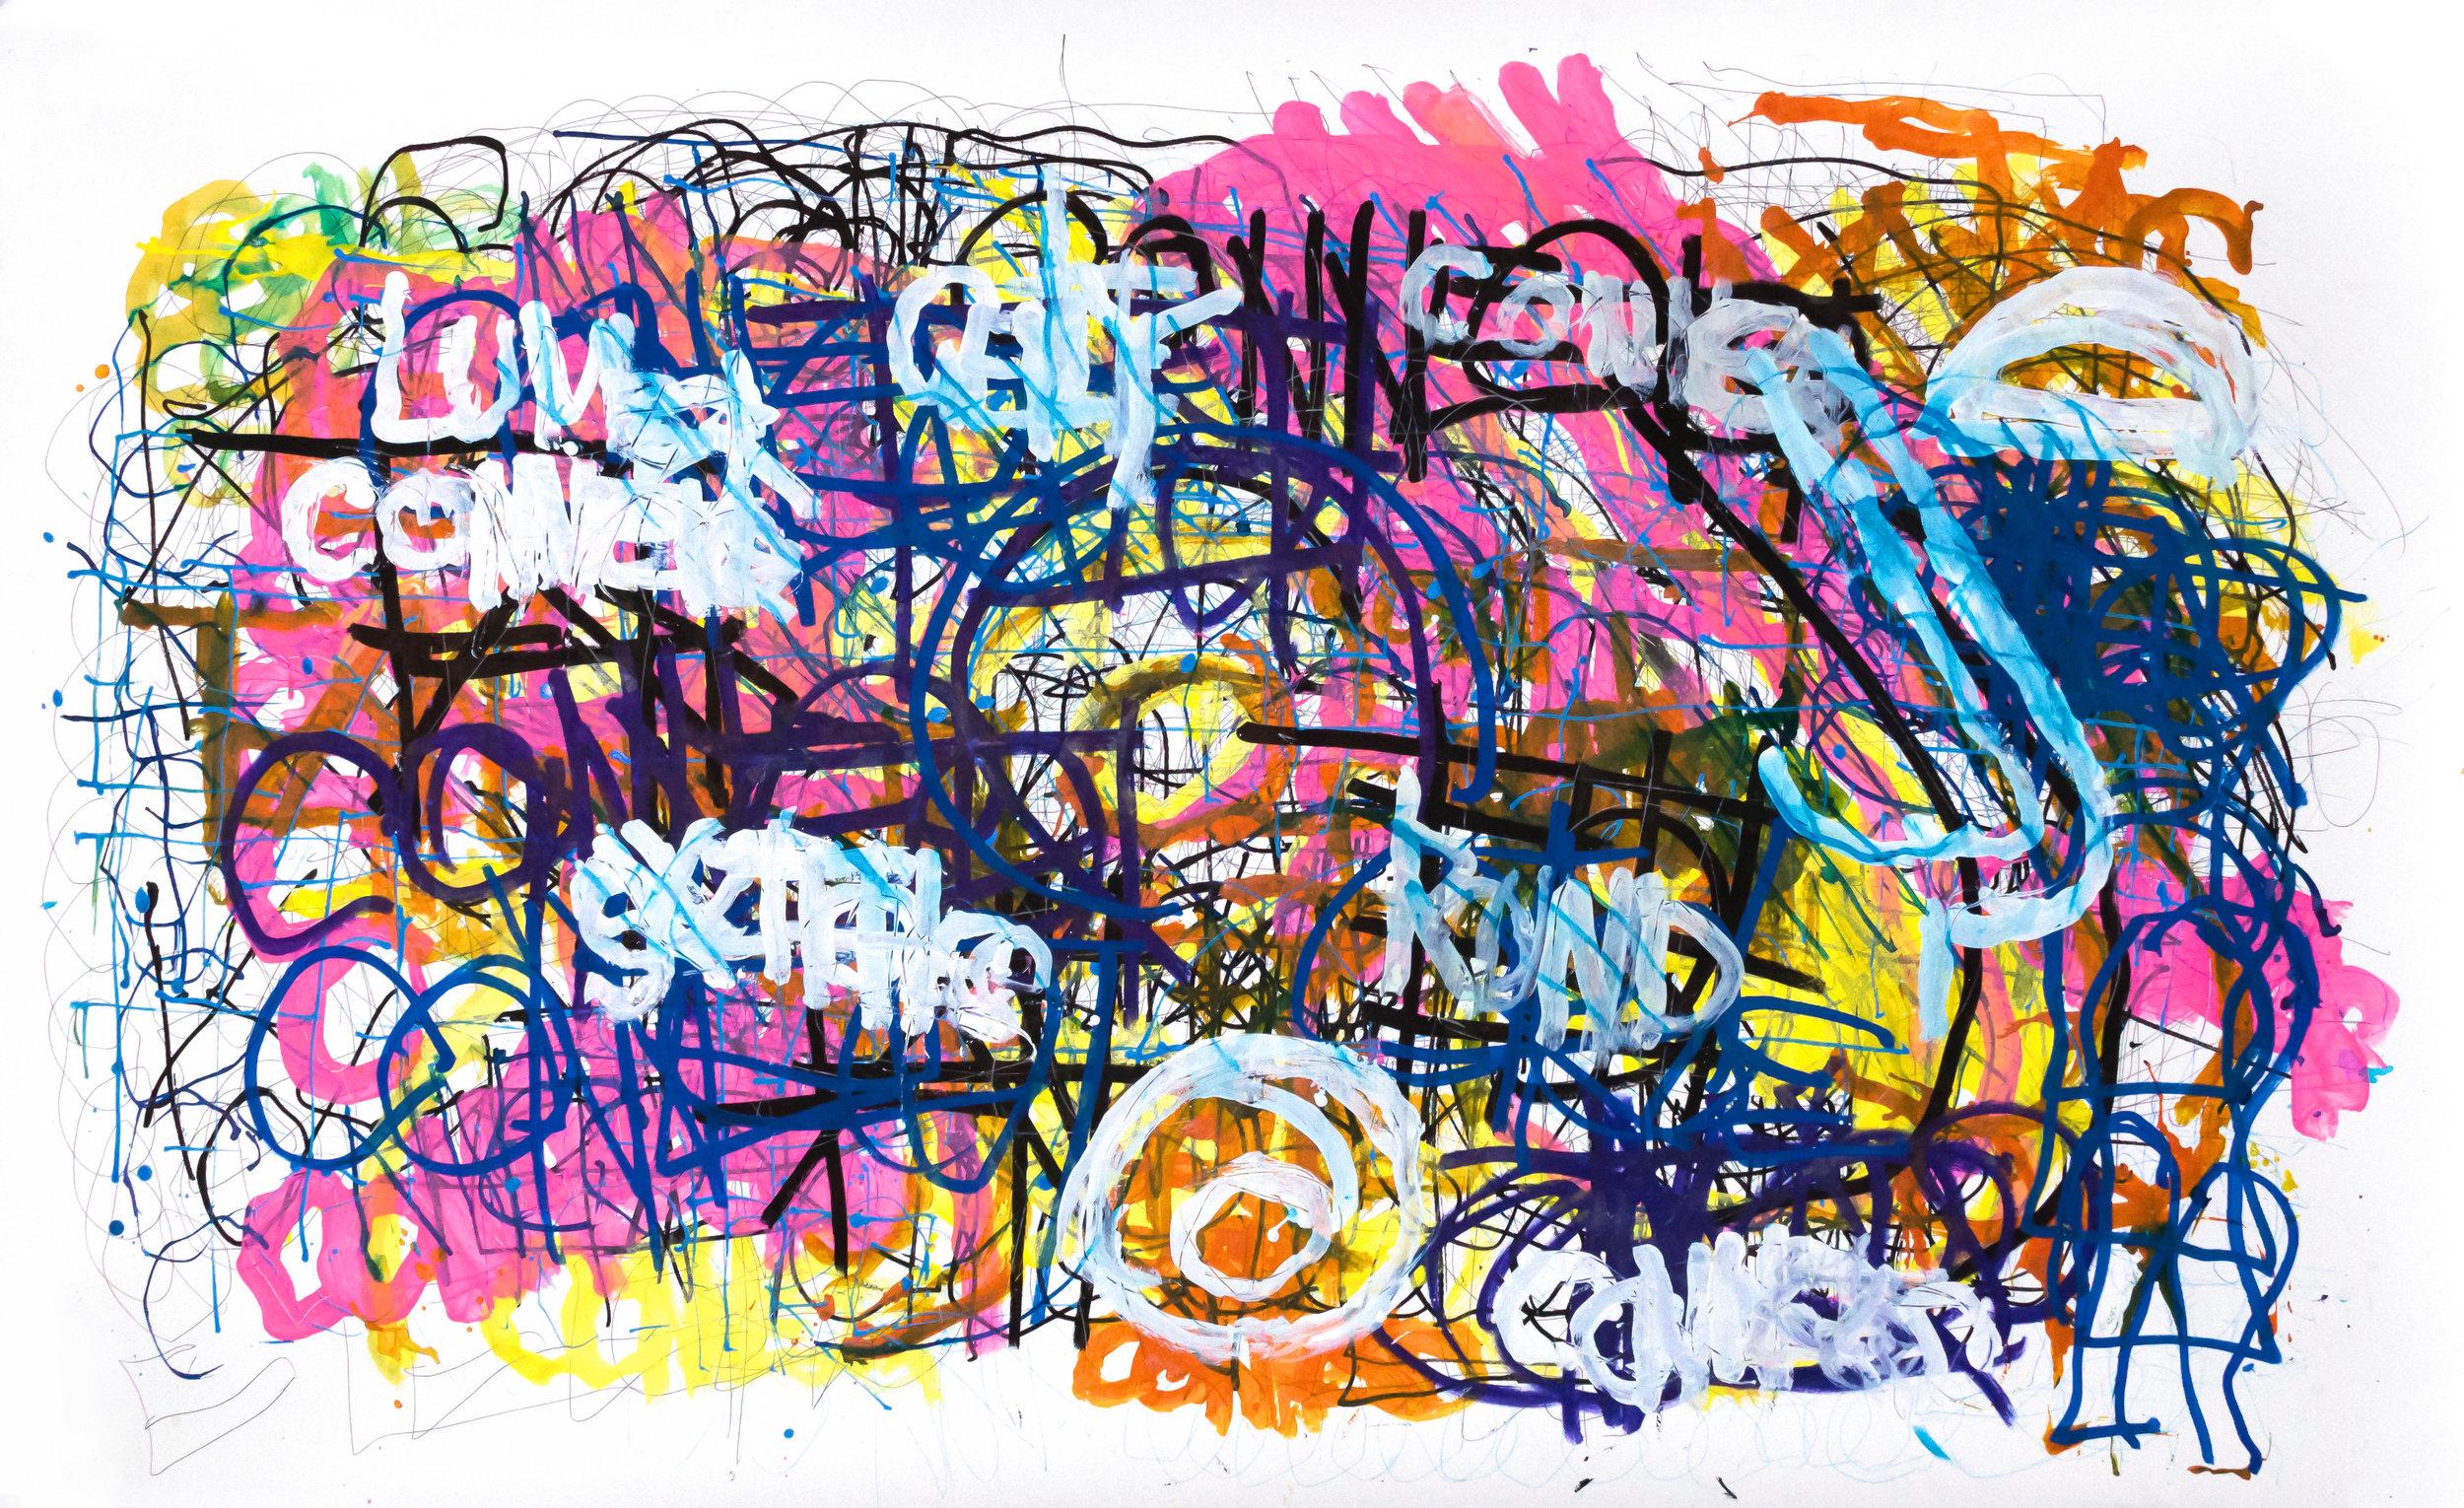 Dan Miller, Untitled (DM 1106), 2019, 36 x 59.25 inches